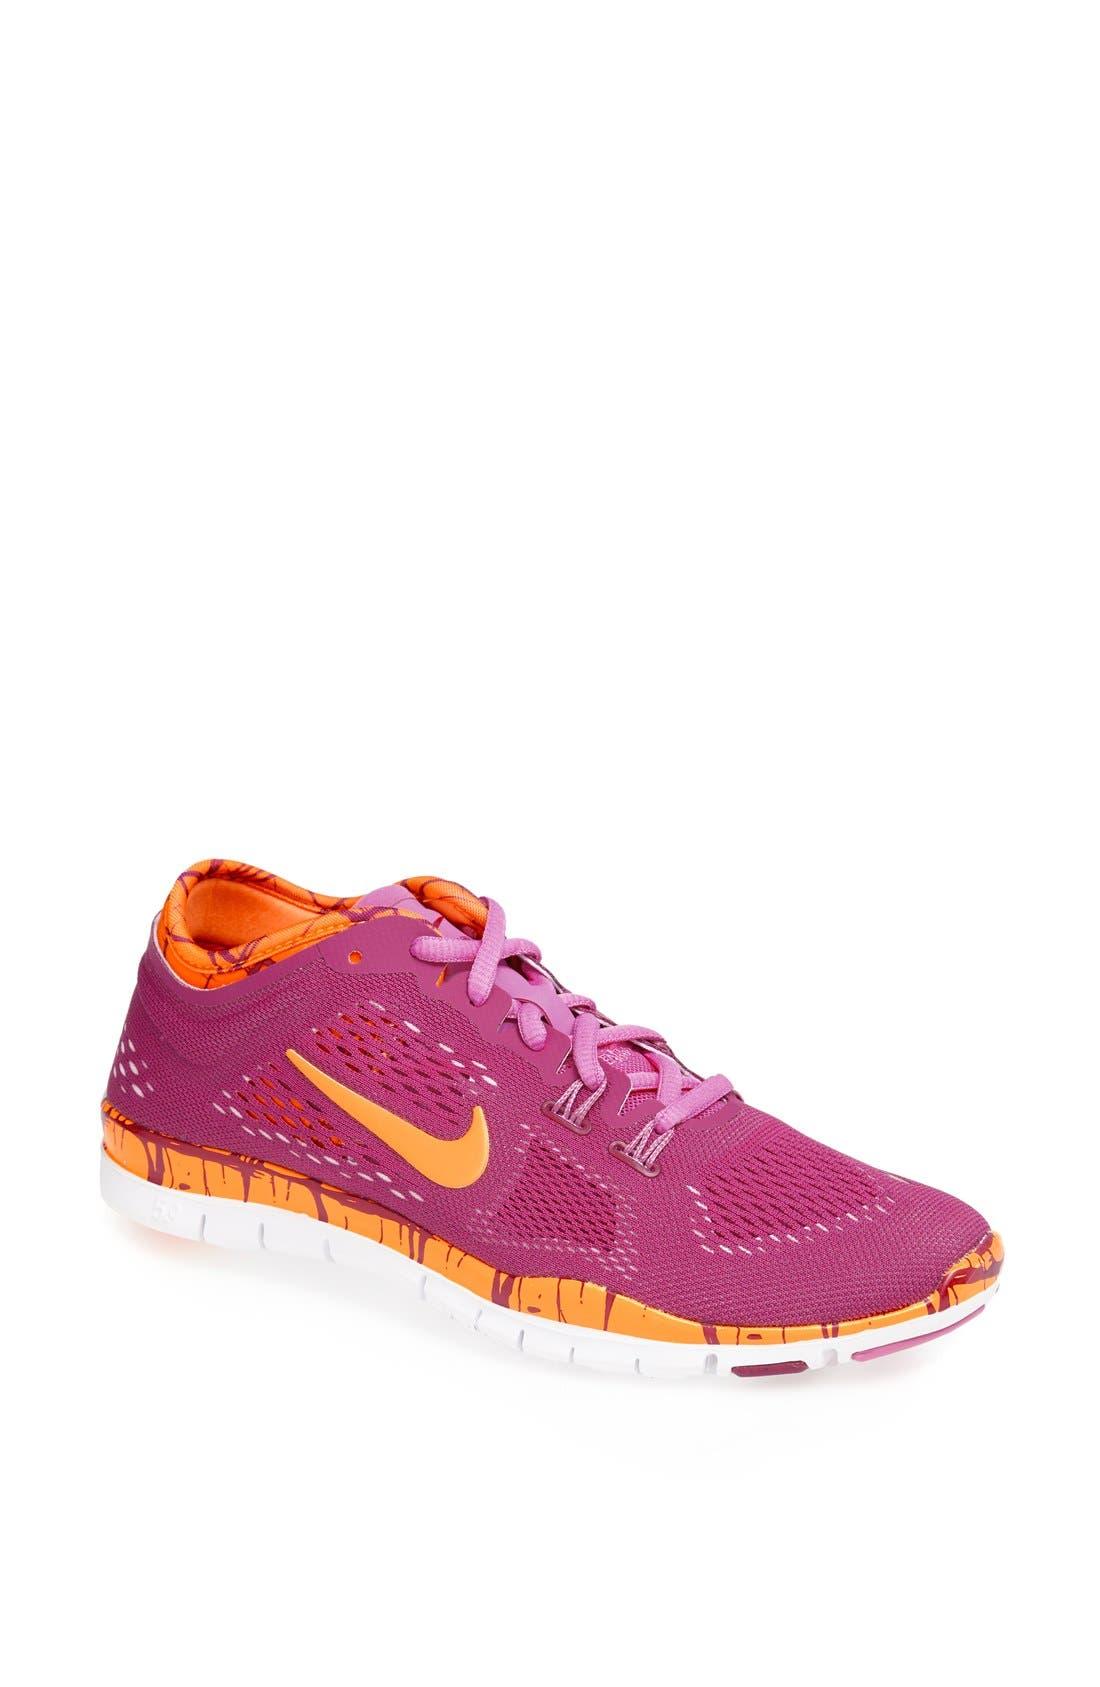 Main Image - Nike 'Free 5.0 TR Fit 4' Print Training Shoe (Women)